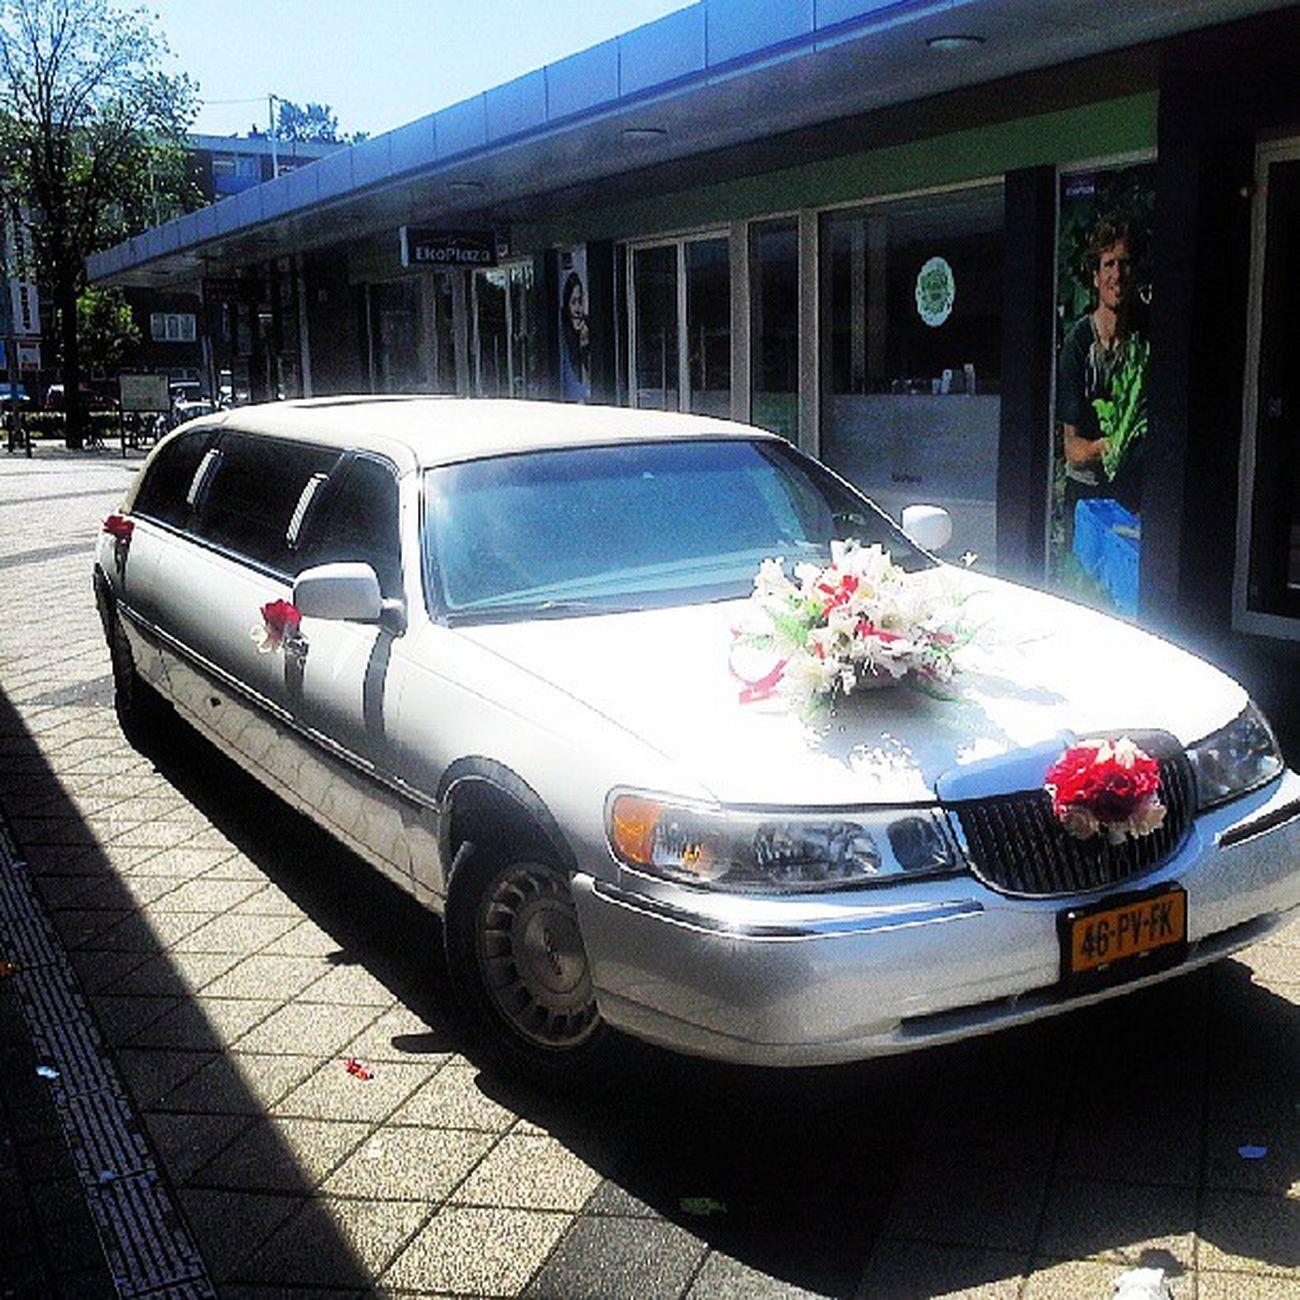 Wedding Sister Limoooo White swag flowers nice like4like amsterdam